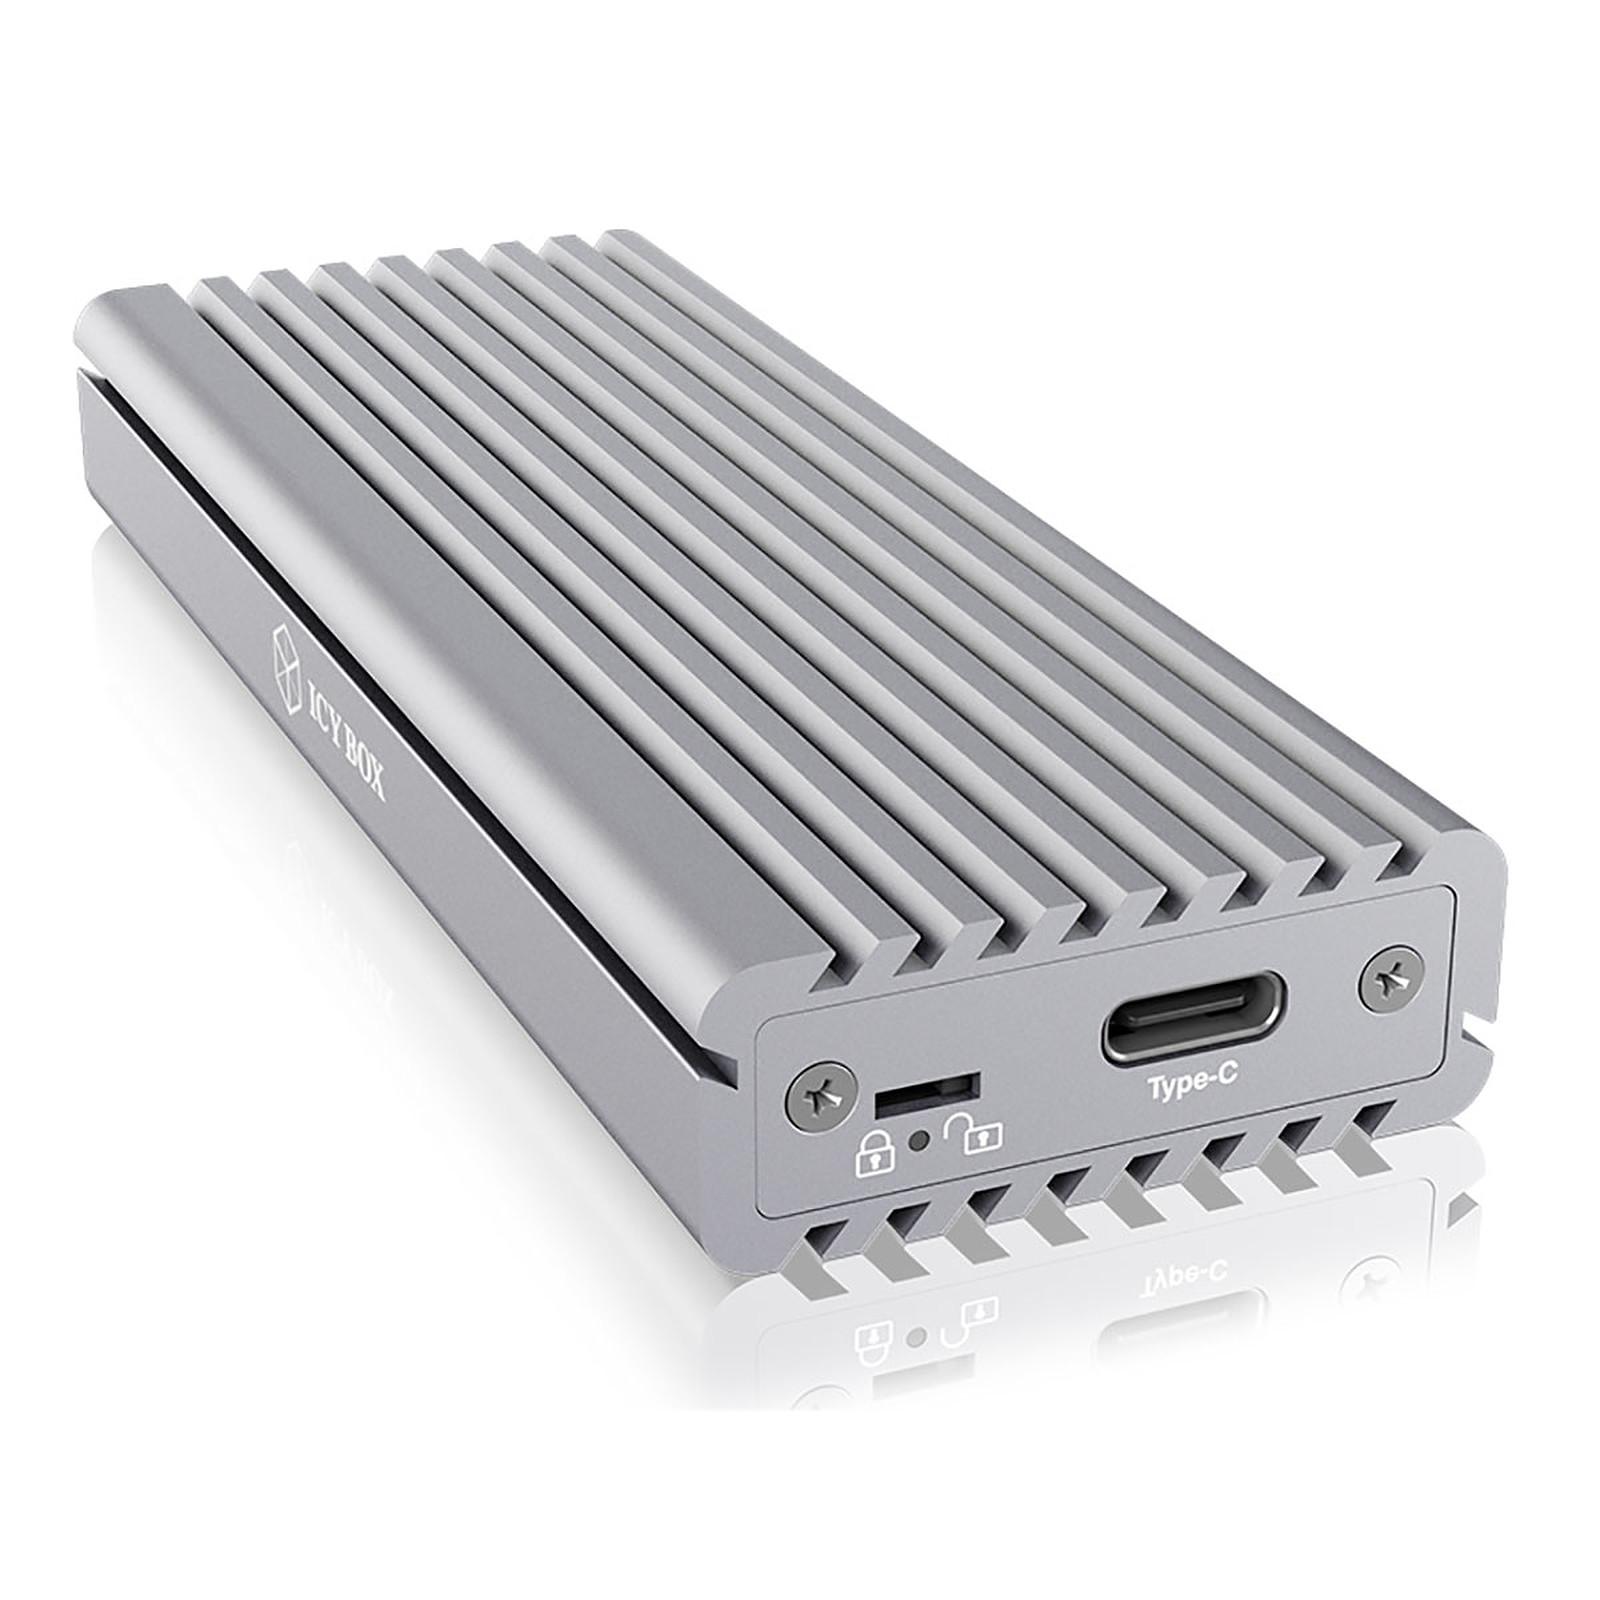 ICY BOX IB-1817MA-C31